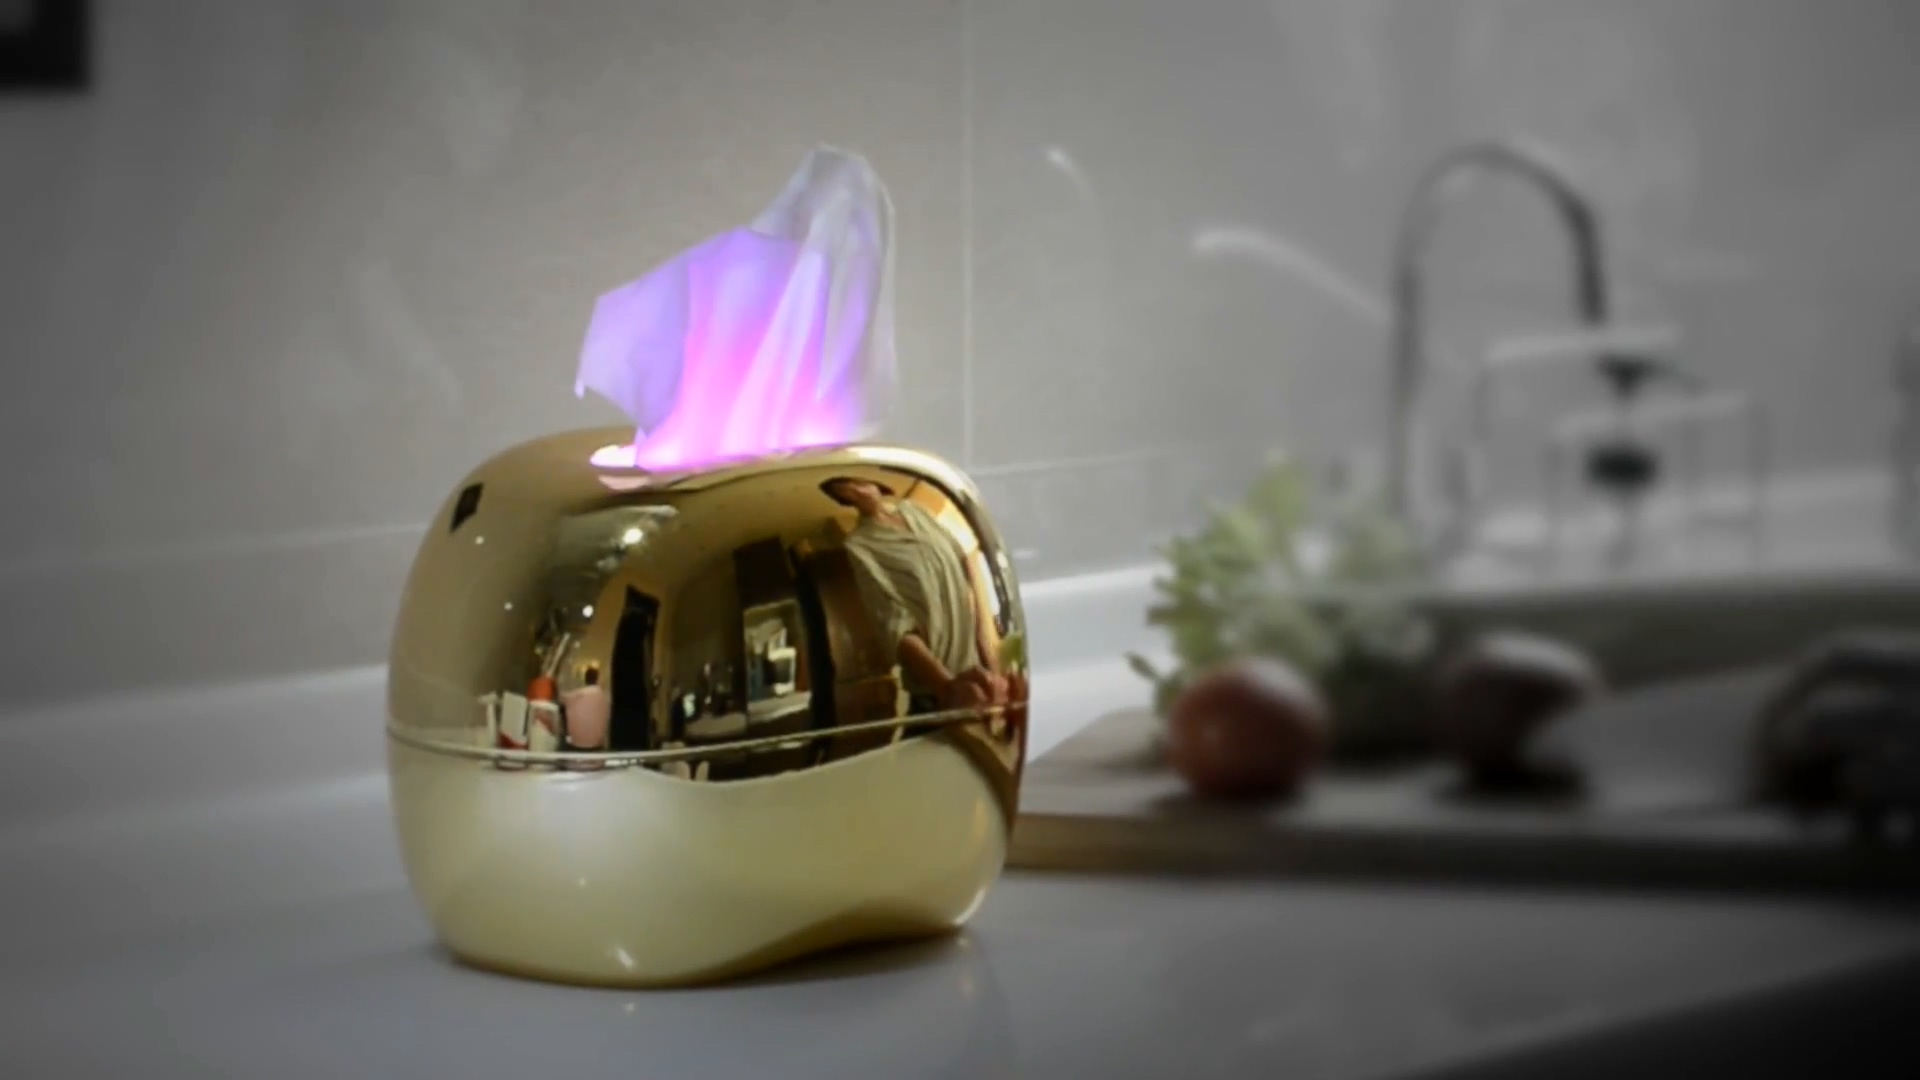 aurora-smart-led-glowing-tissue-case-5